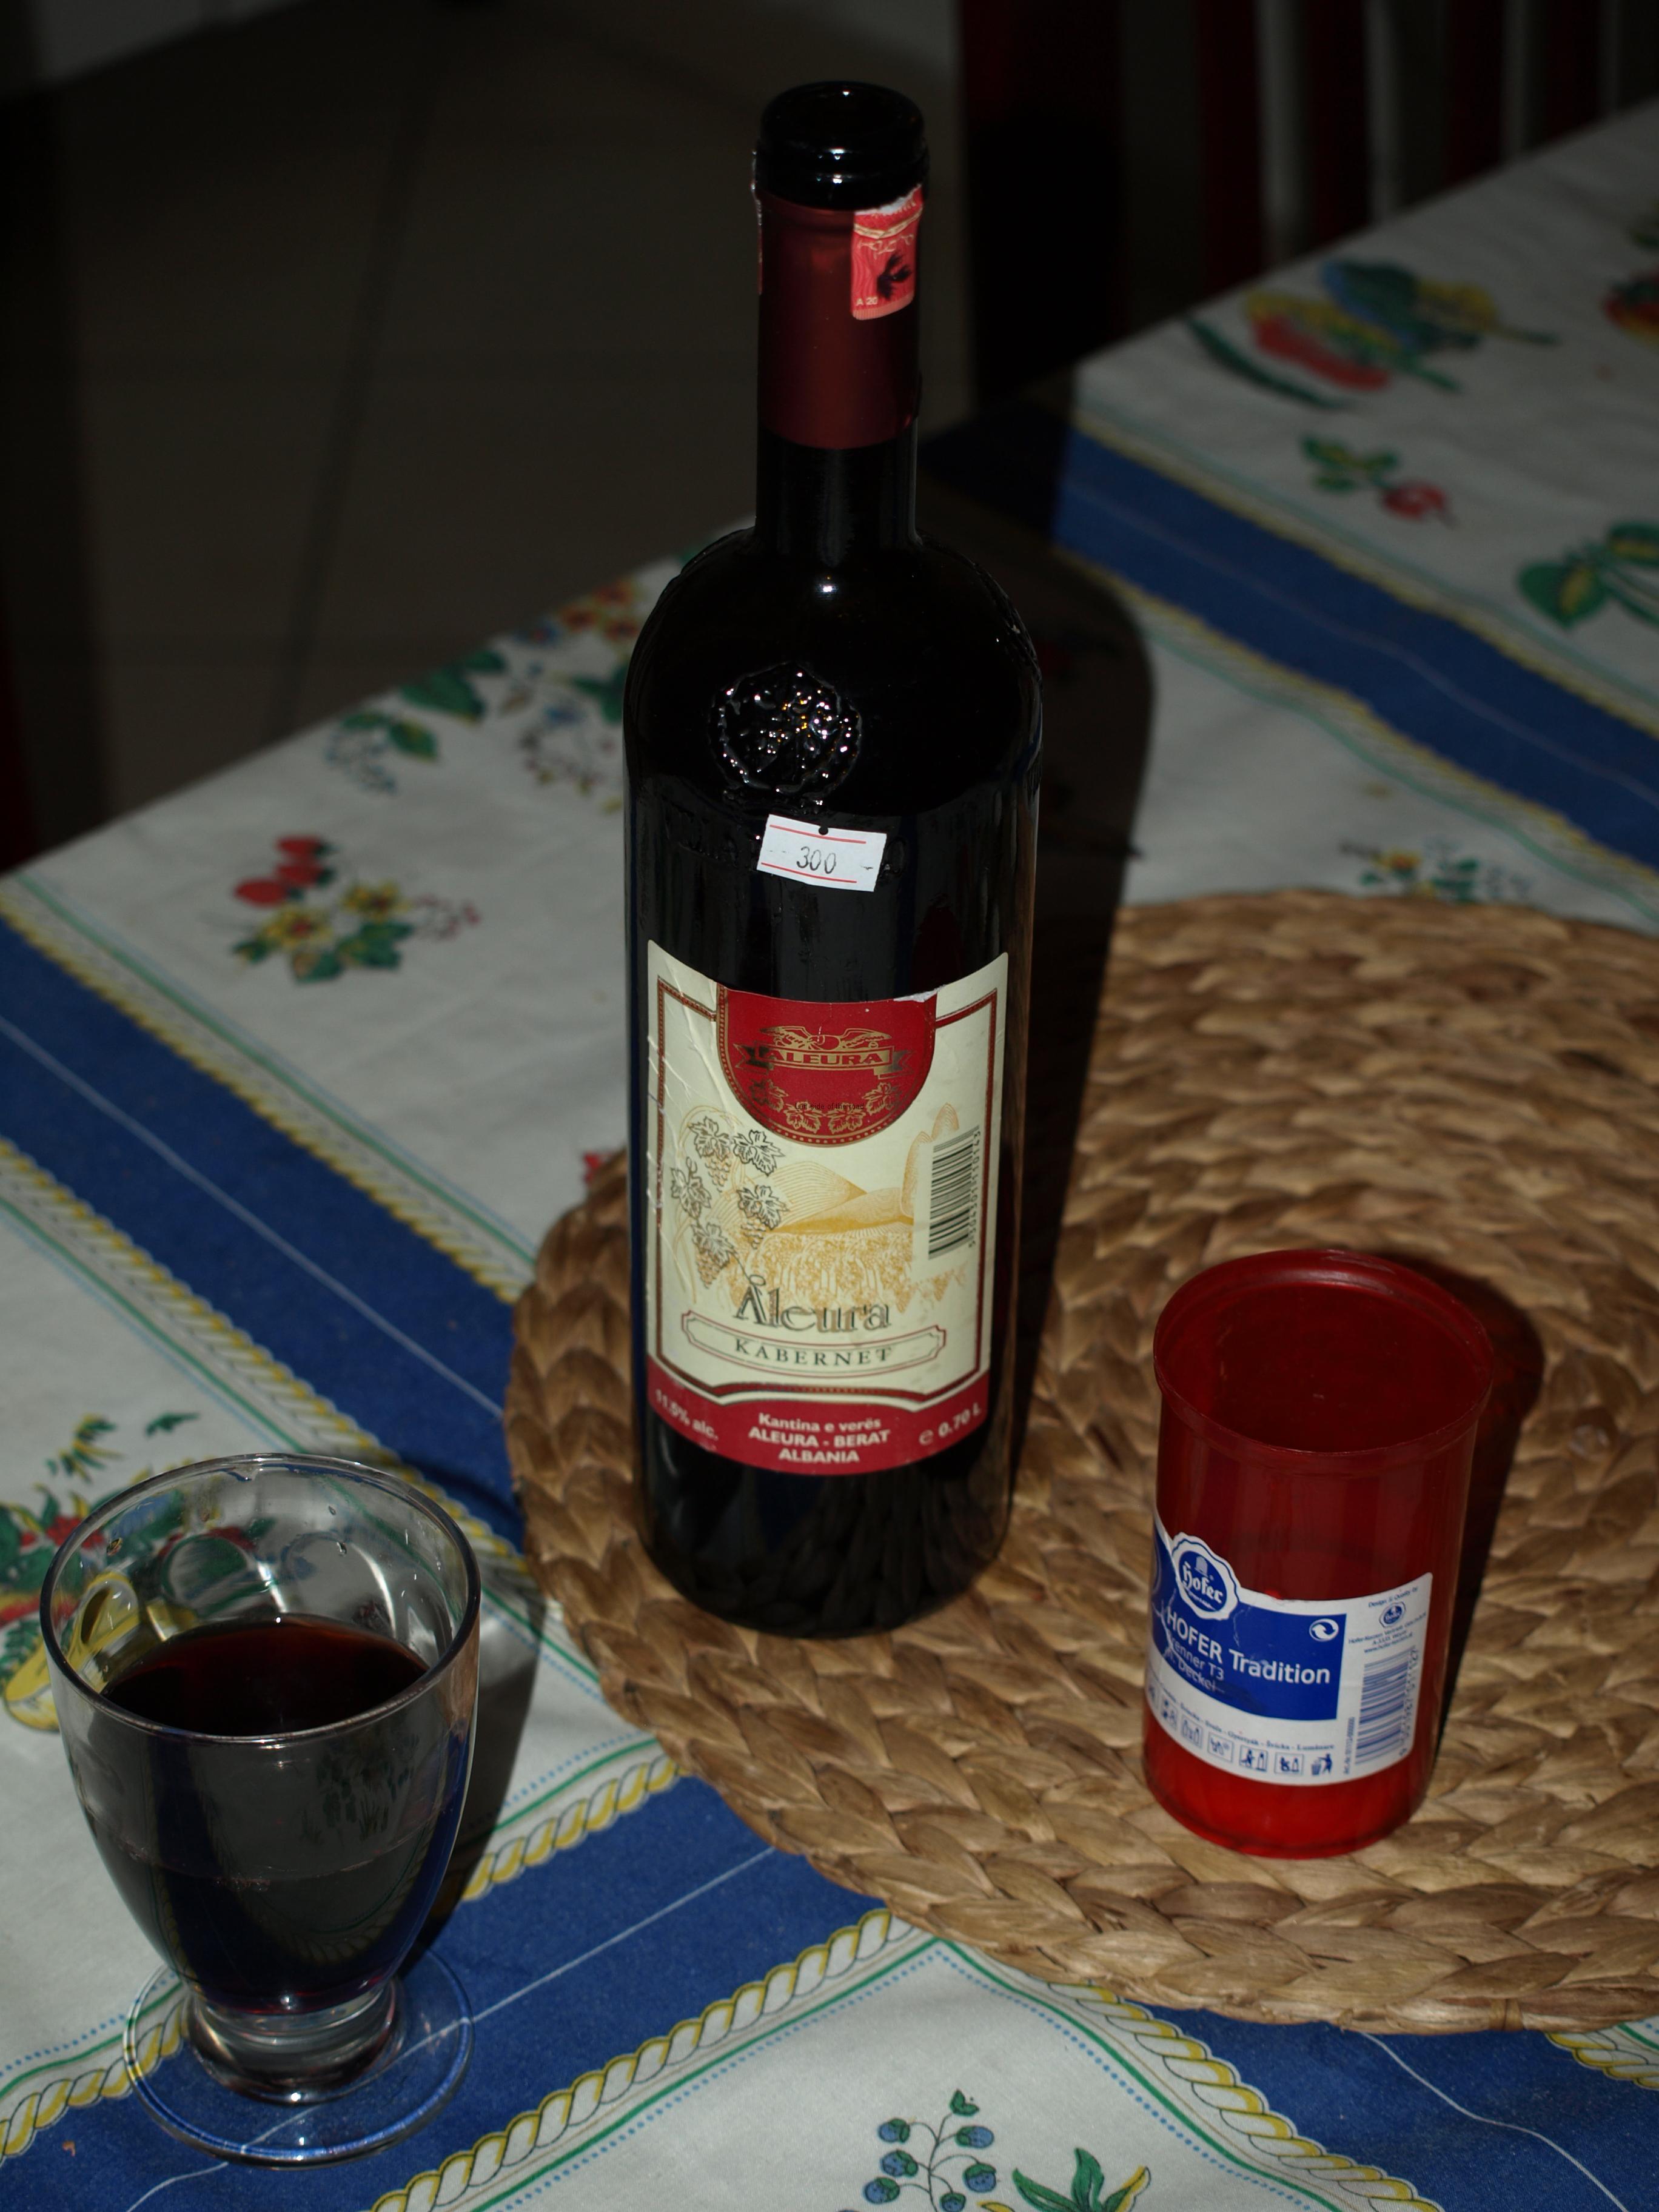 Aleura Kabernet Red Wine, Berat, Albania